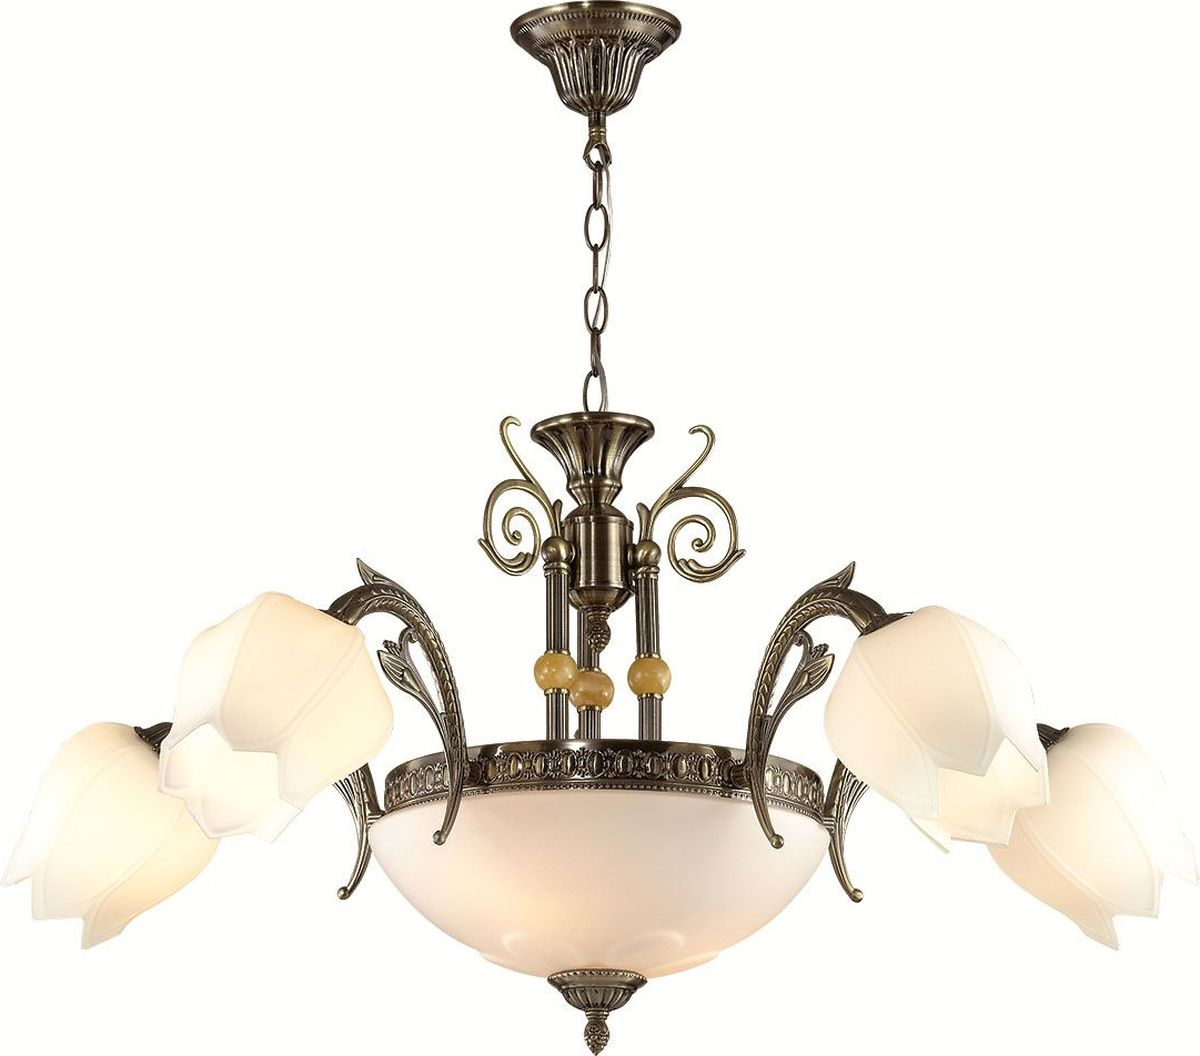 Люстра подвесная Lumion Lysette, цвет: белый, E27, 60 Вт. 2986/7A2986/7A